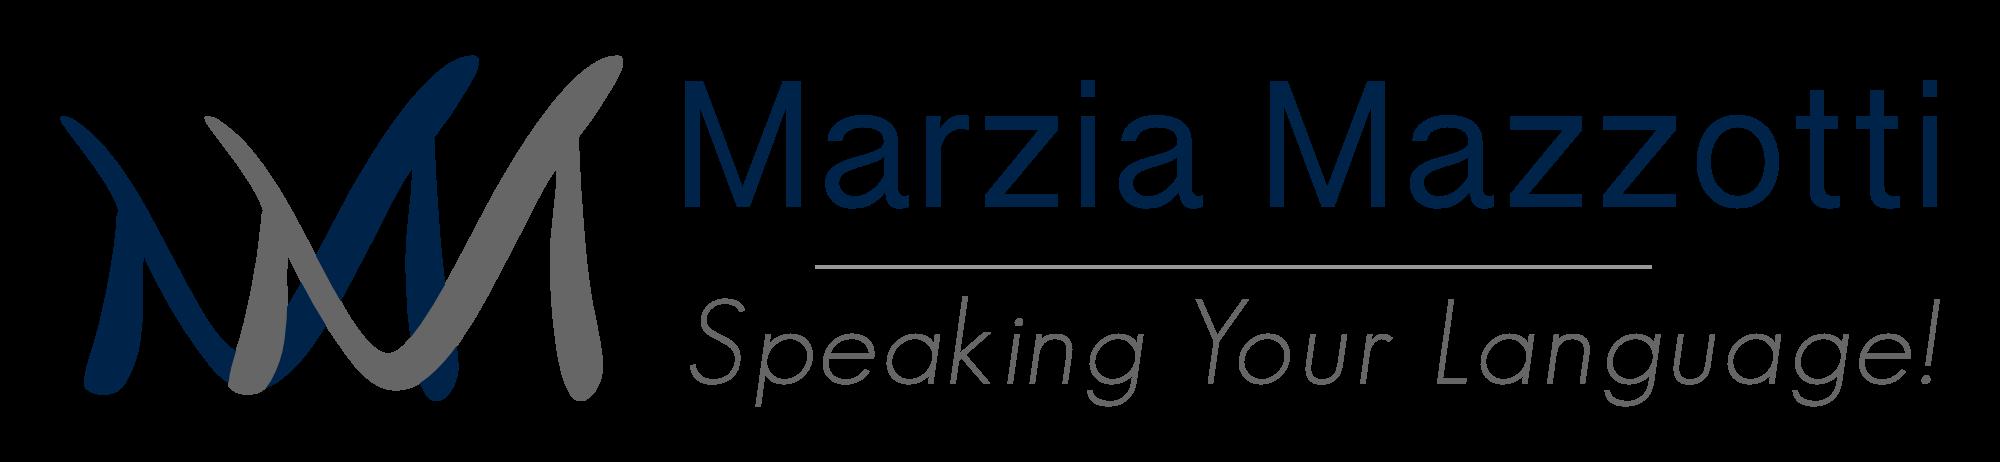 Marzia Mazzotti - Lake Norman, NC Real Estate